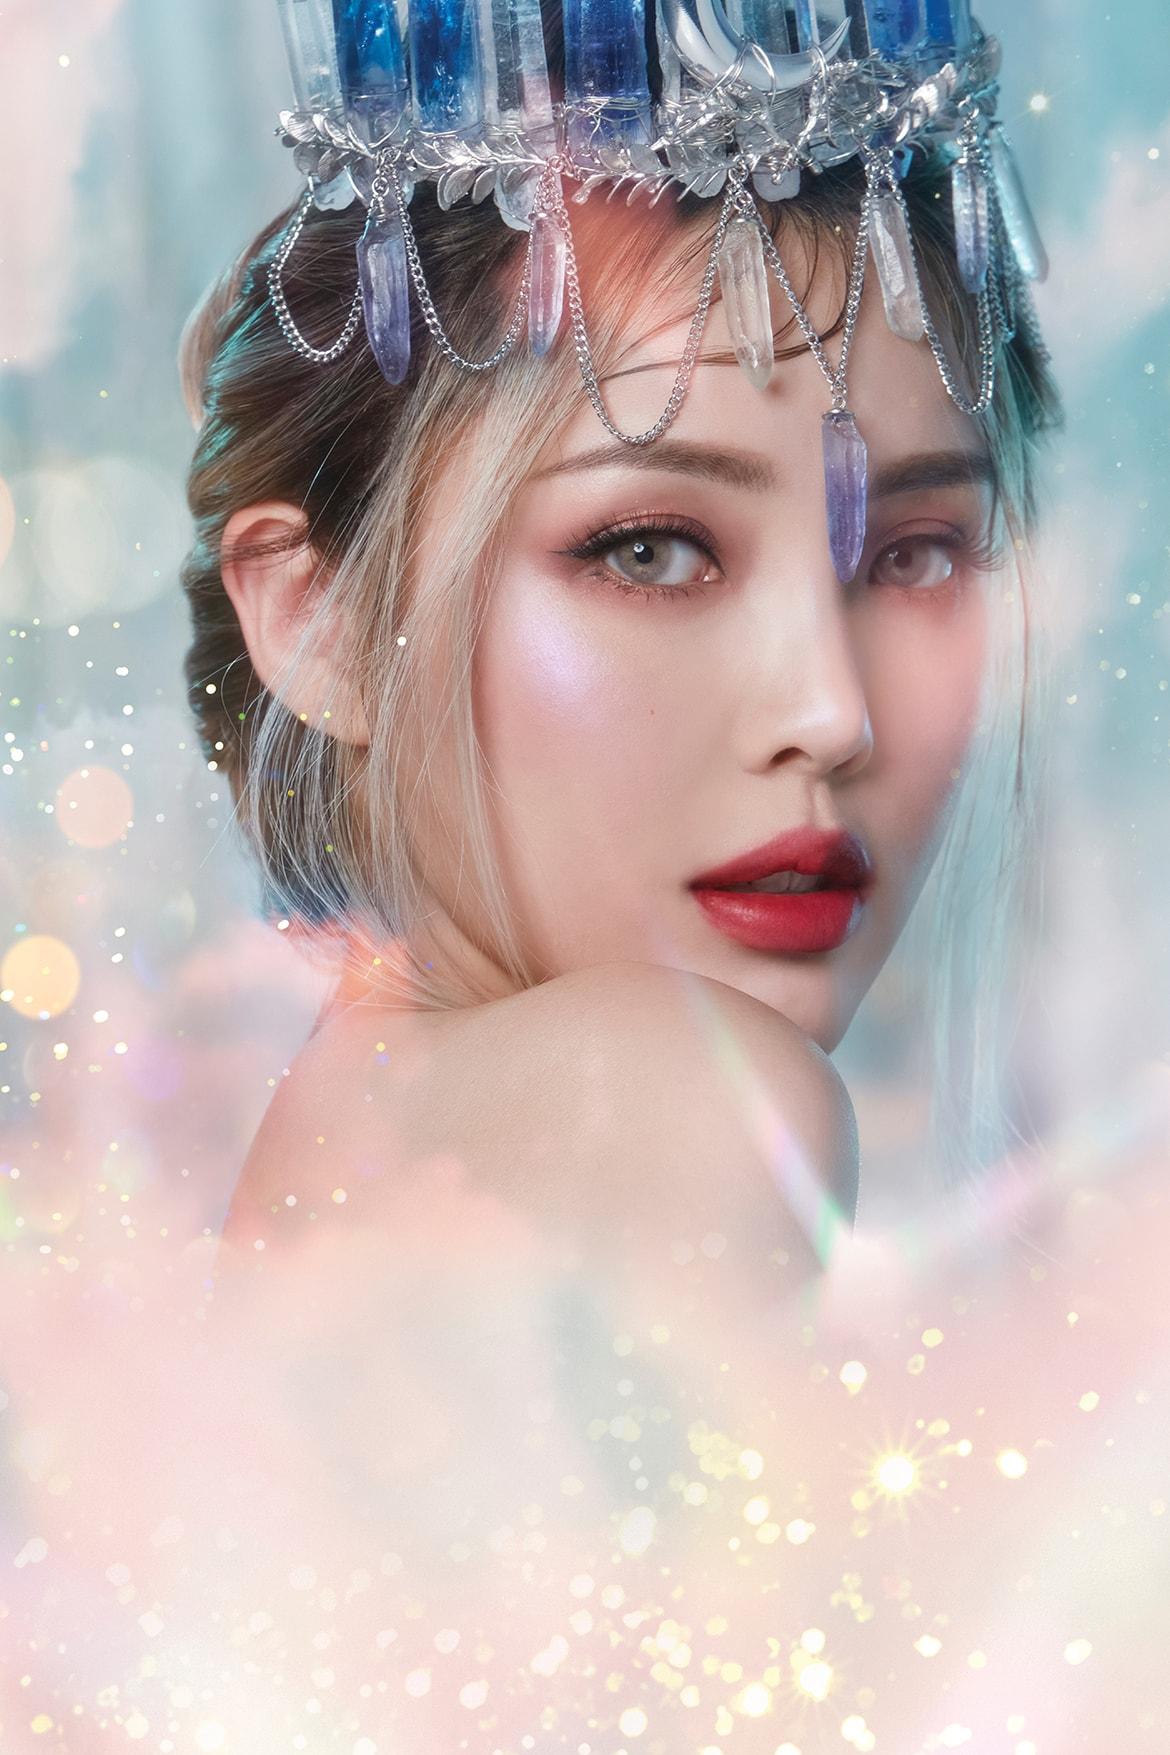 Makeup Artist Pony Mac Collaboration